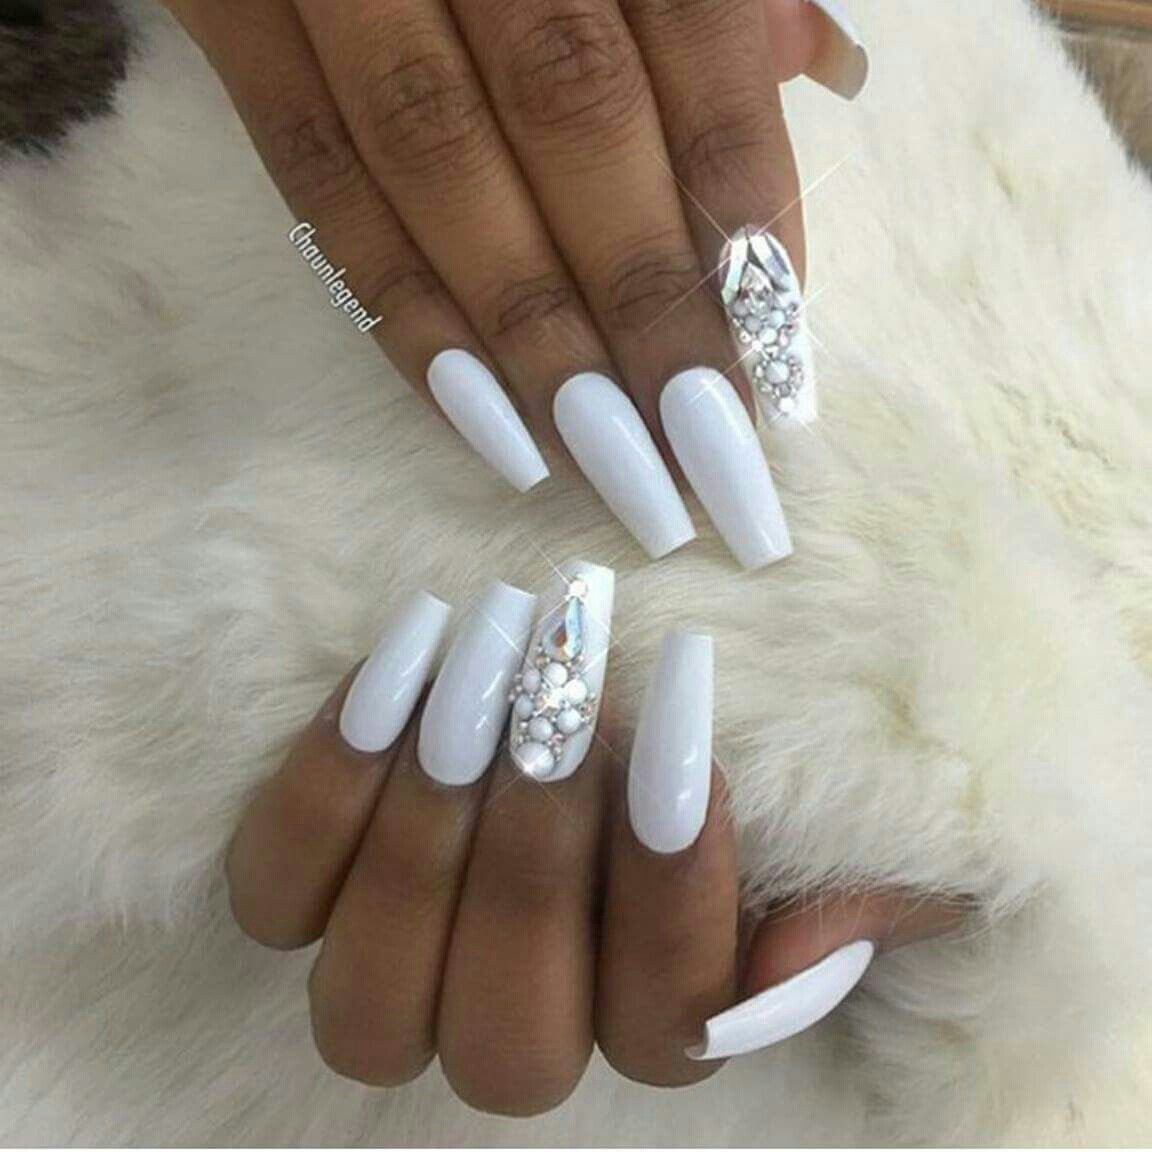 Pin By Gabriela Larios Aguilar On Unas White Coffin Nails White